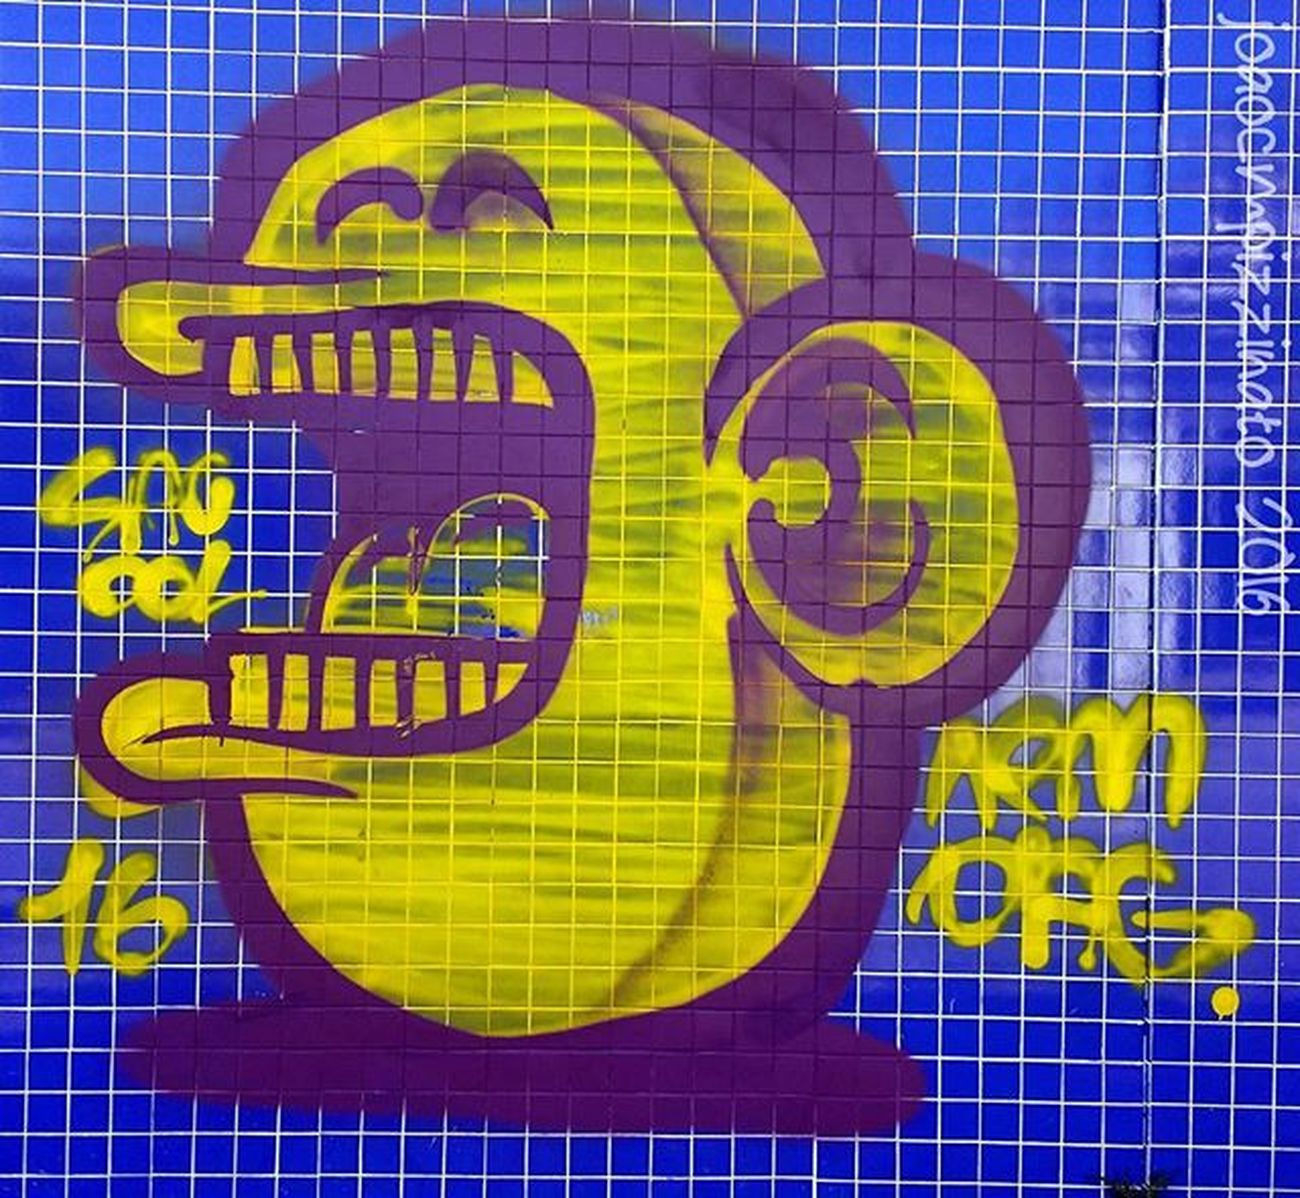 Graffiti Graffitiart Art Streetart UrbanART Streetphotography Urban Streetphoto_brasil Colors City Zonasul Saopaulo Brasil Photograph Photography Flaming_abstracts Mundoruasp Olhonaruasp Urbexbrasil Urbexsp